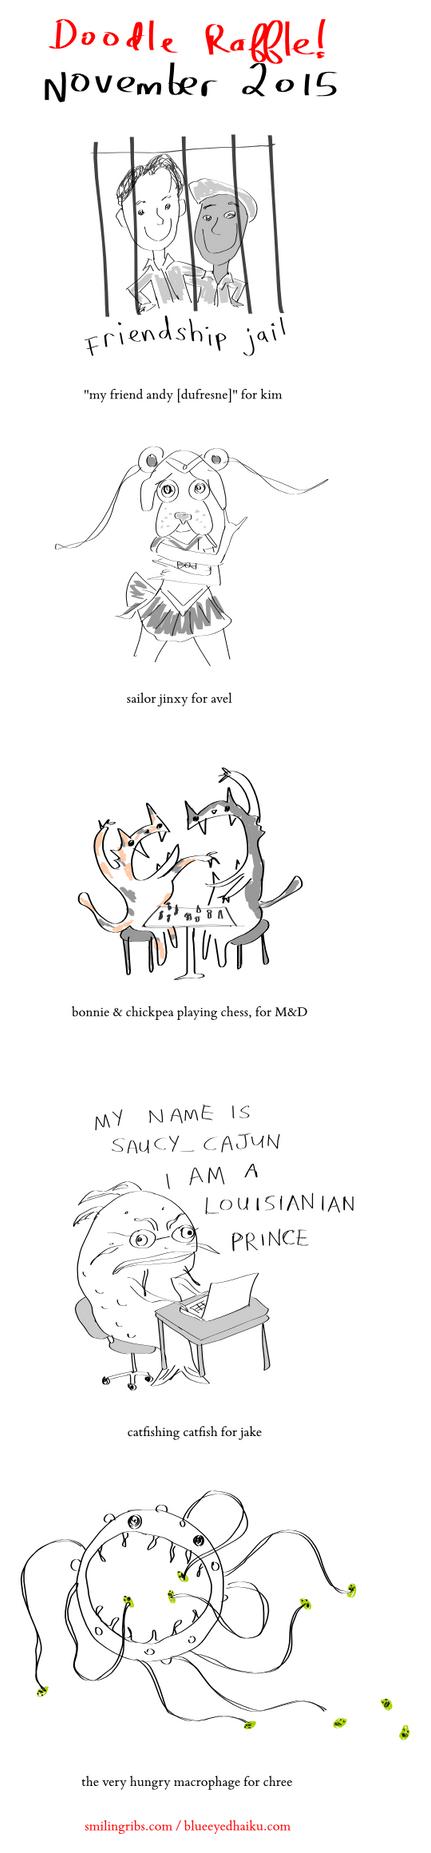 november 2015 doodle raffle by inkblort